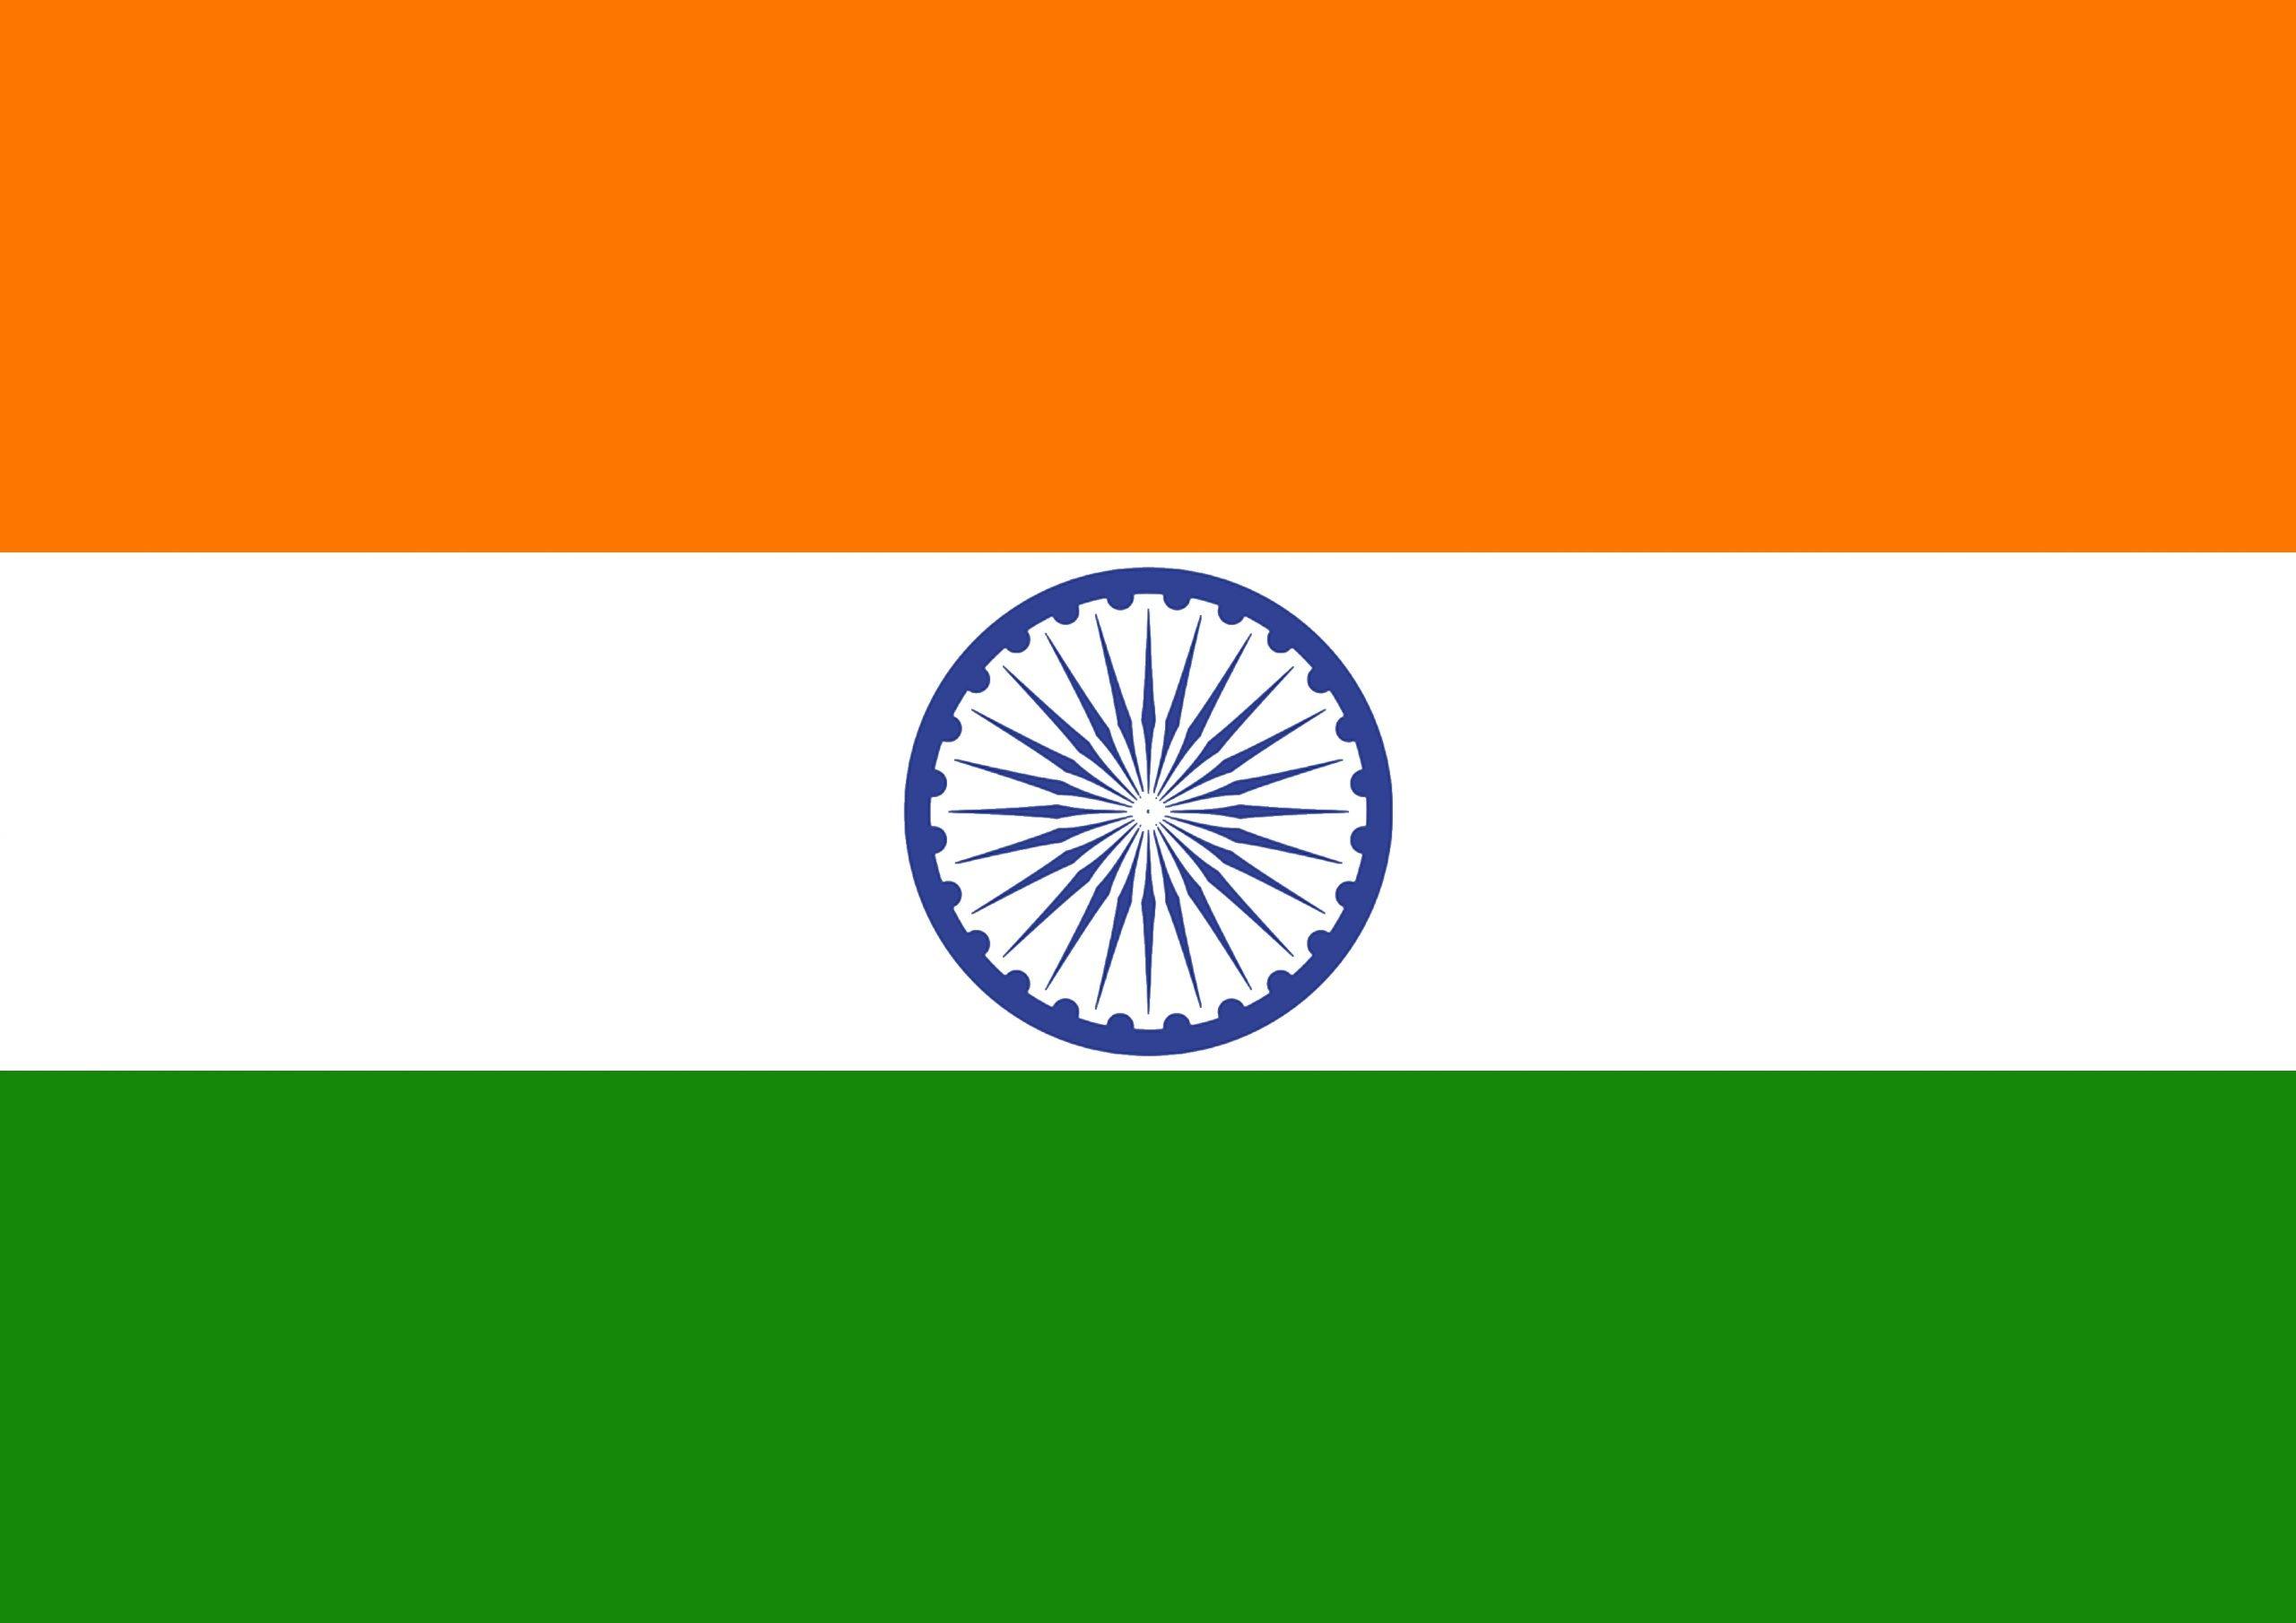 Travcour Visa & Legalisation Services Limited India Visa Application